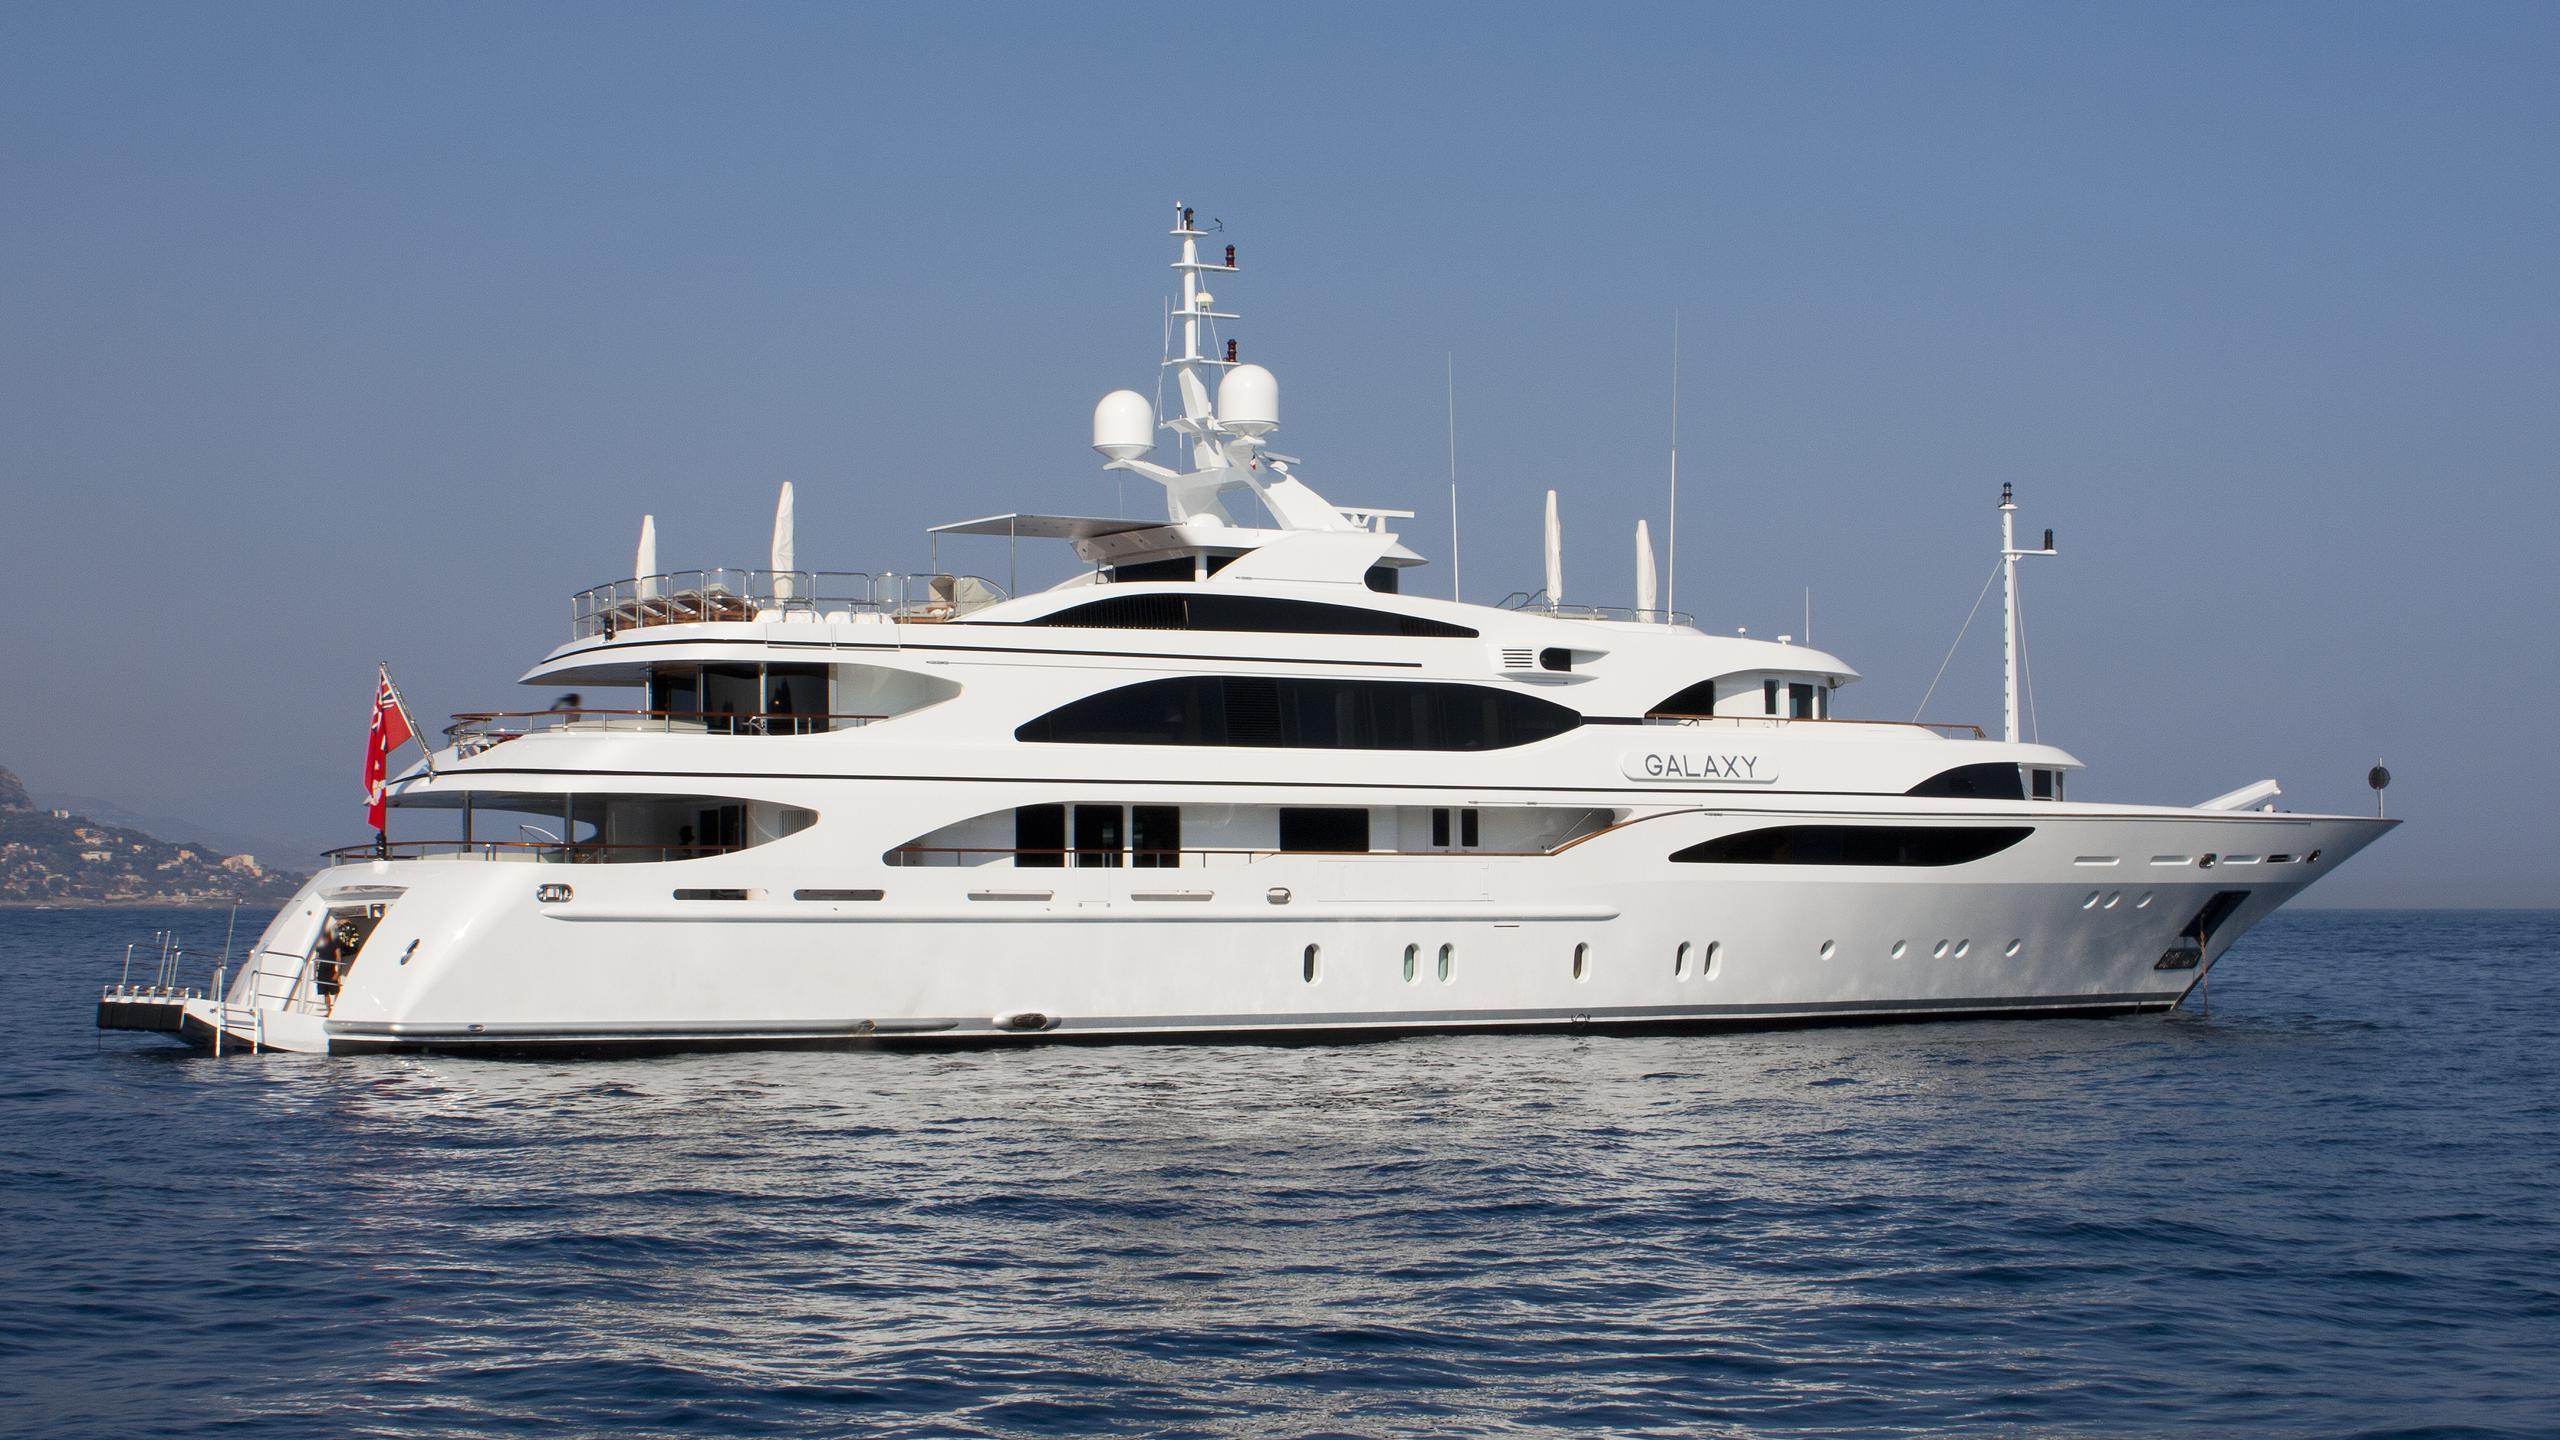 galaxy-yacht-exterior